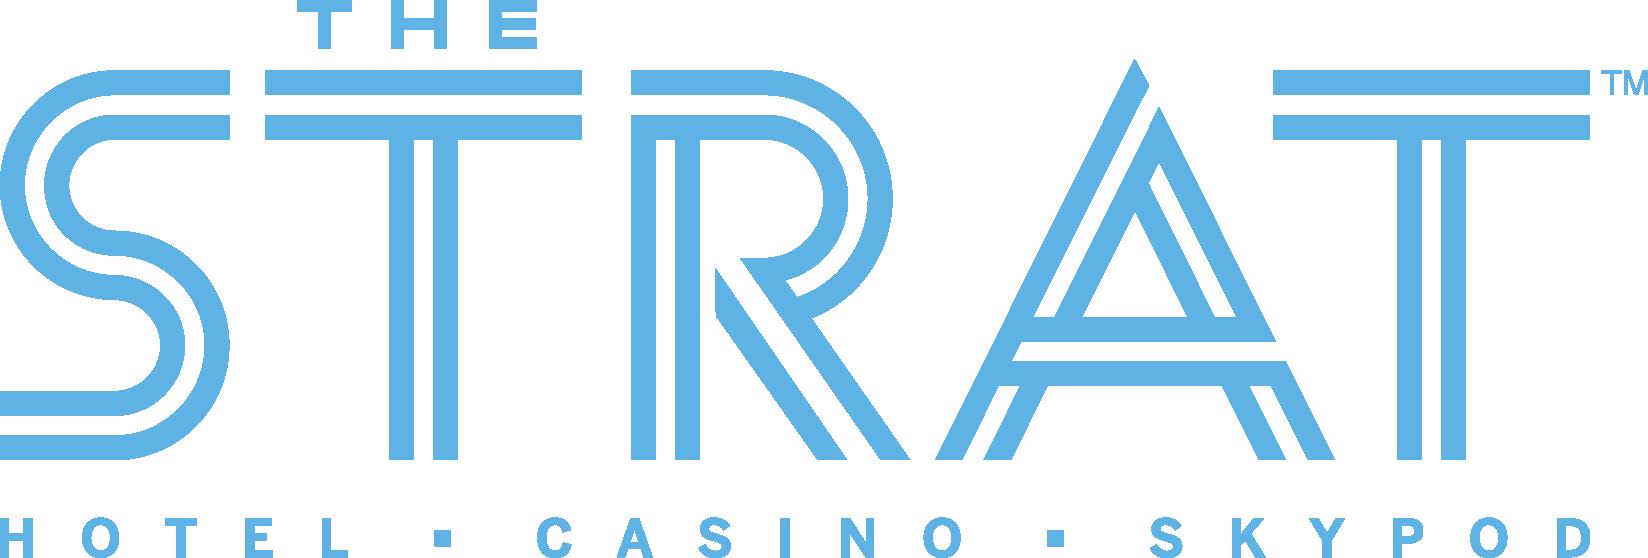 https://brandoutlook.com/wp-content/uploads/2019/06/STRAT-Logo-Blue-2.png